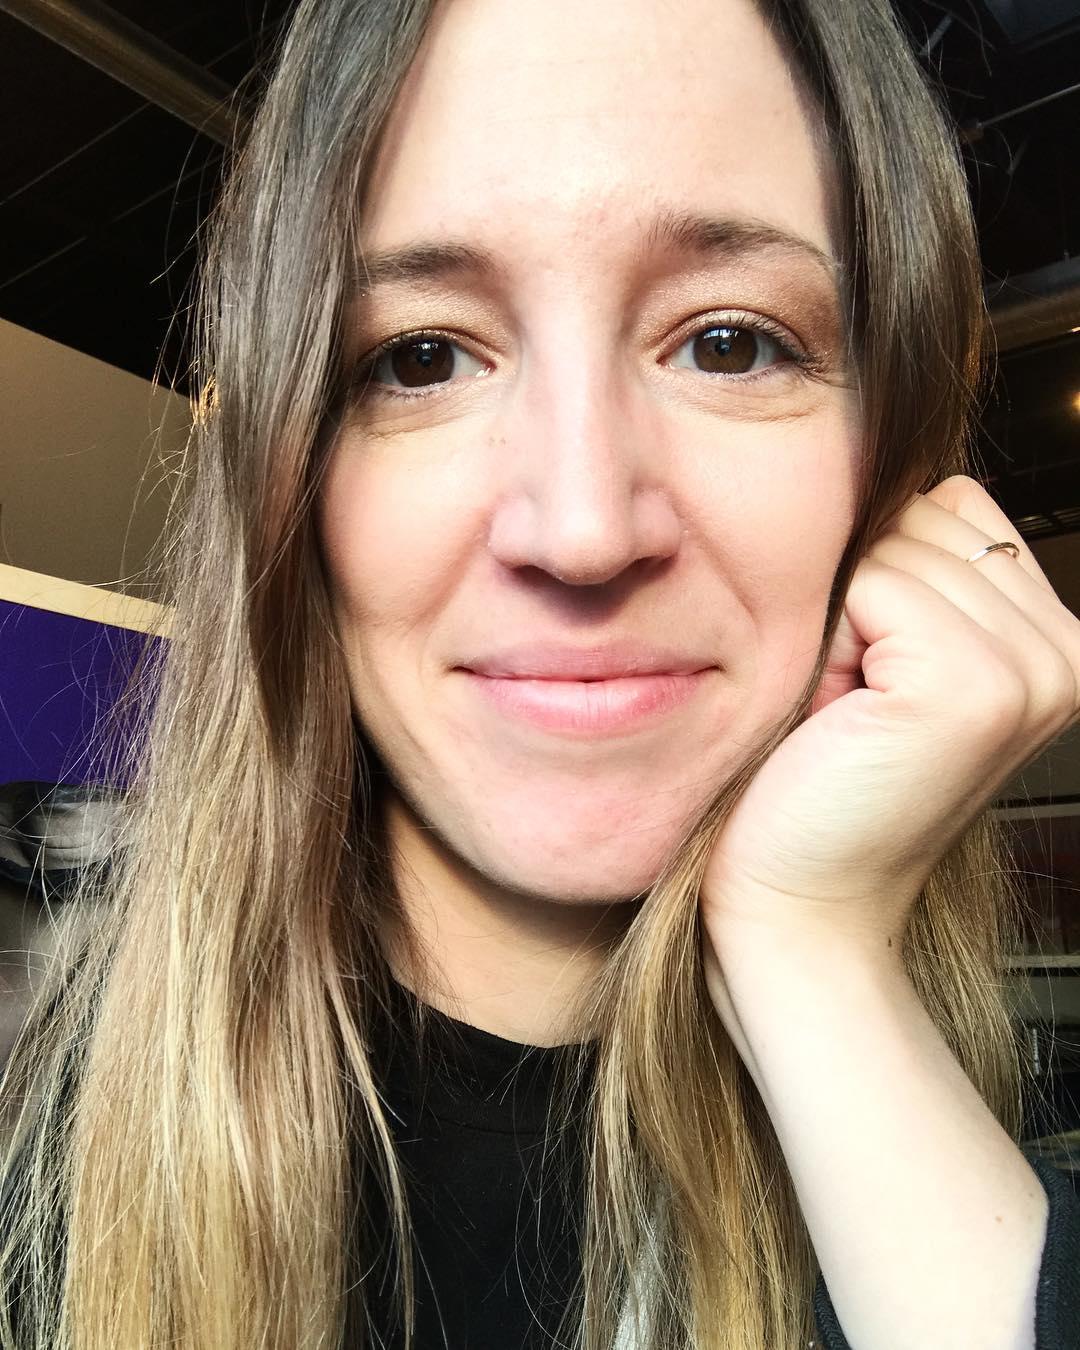 Printmaker Profile: Meg of Team Parabo